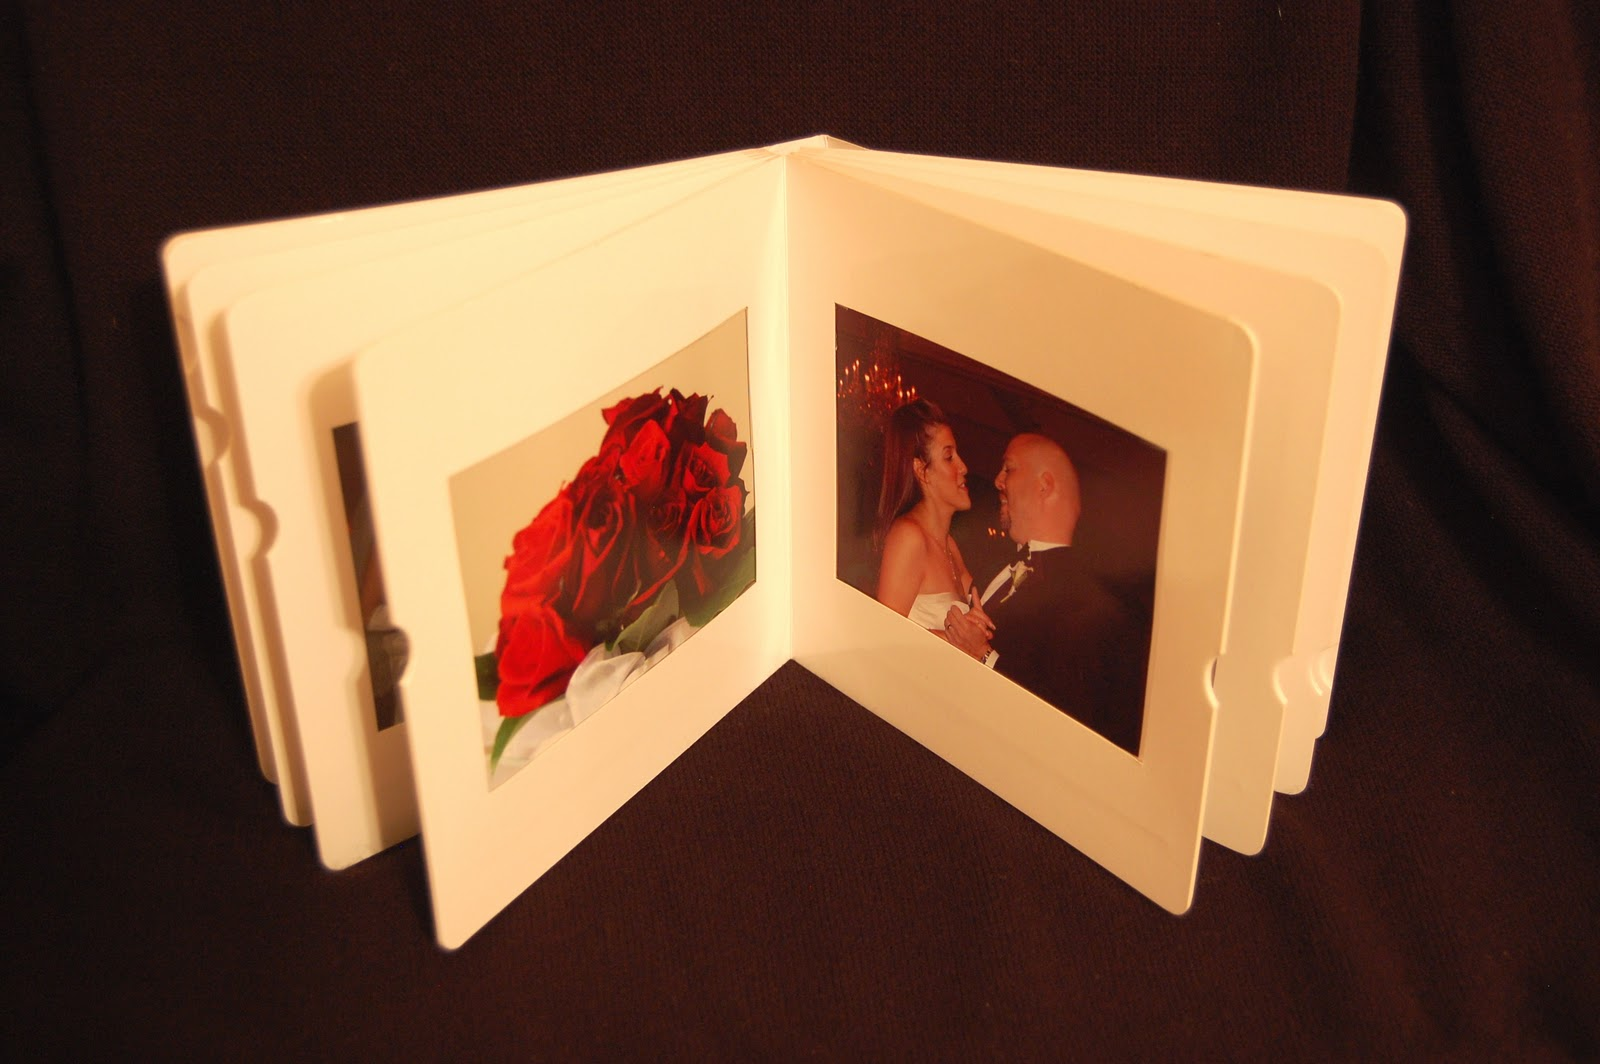 bizzimommi 39 s blog bggg take your pix board book photo album. Black Bedroom Furniture Sets. Home Design Ideas